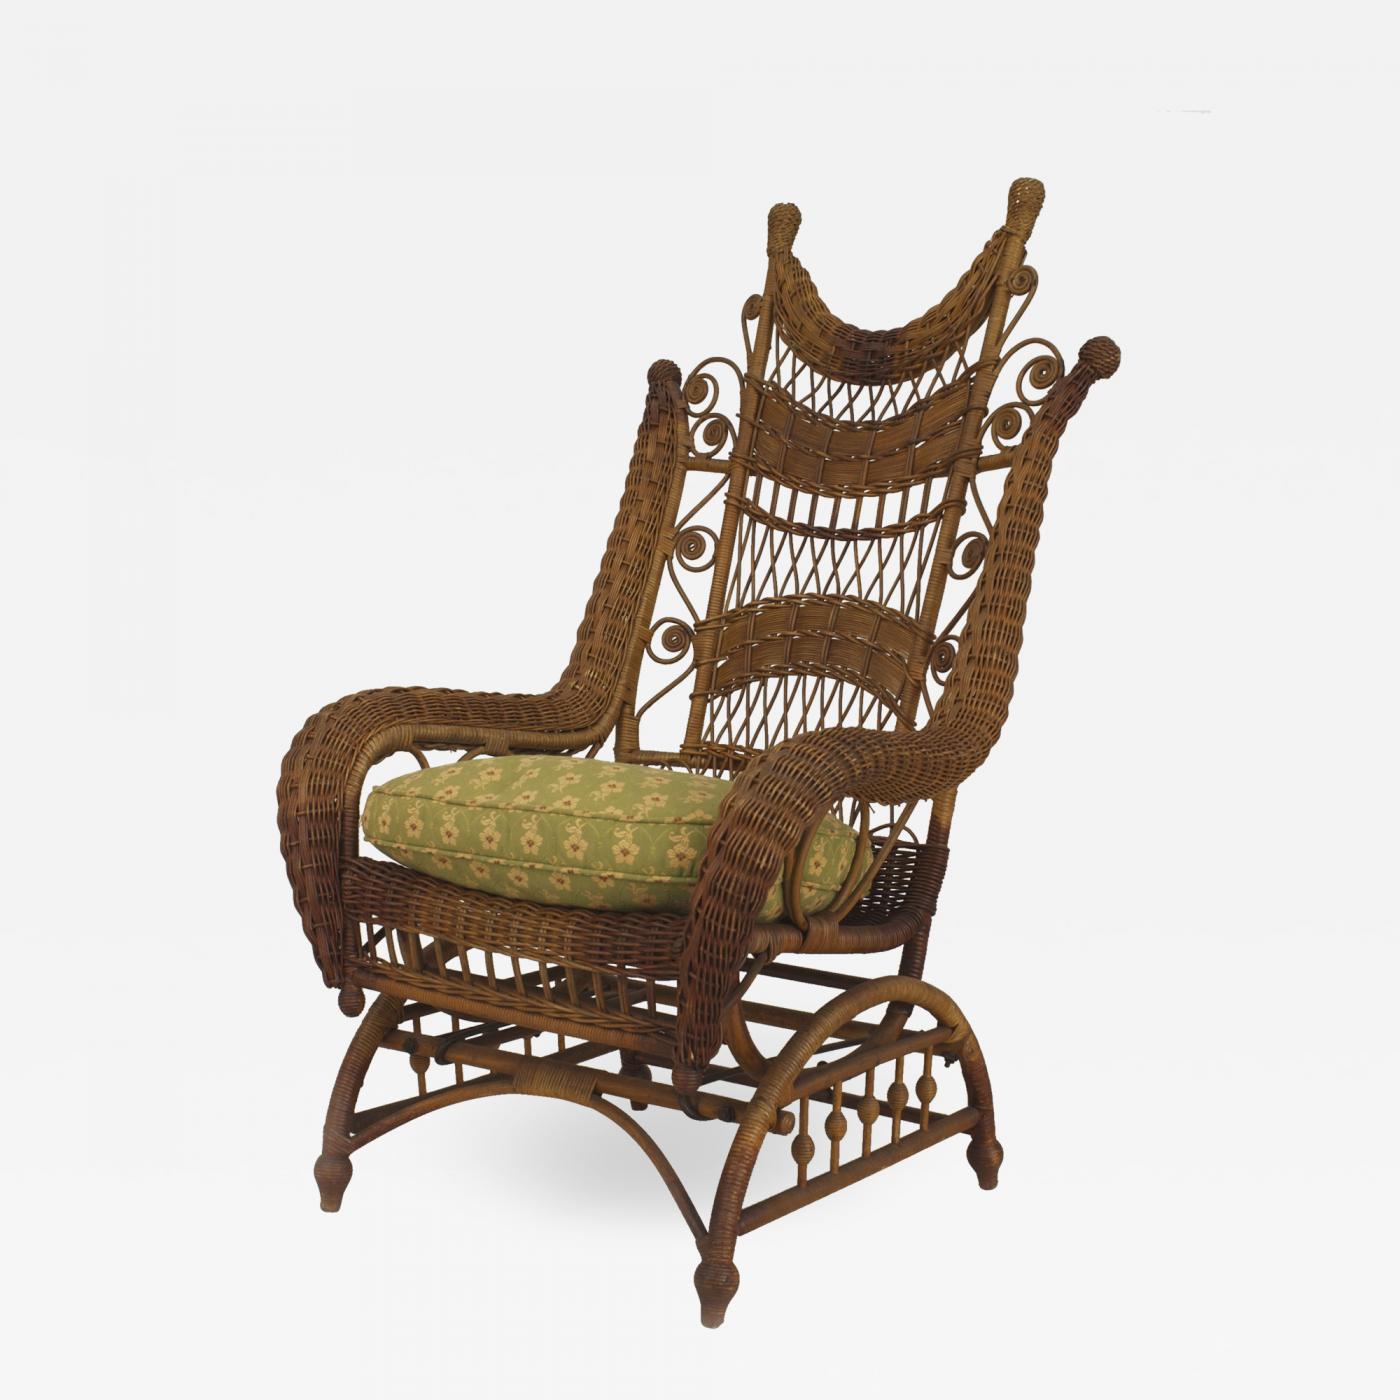 Heywood Wakefield American Victorian Natural Wicker Ornate High Back Platform Rocking Chair